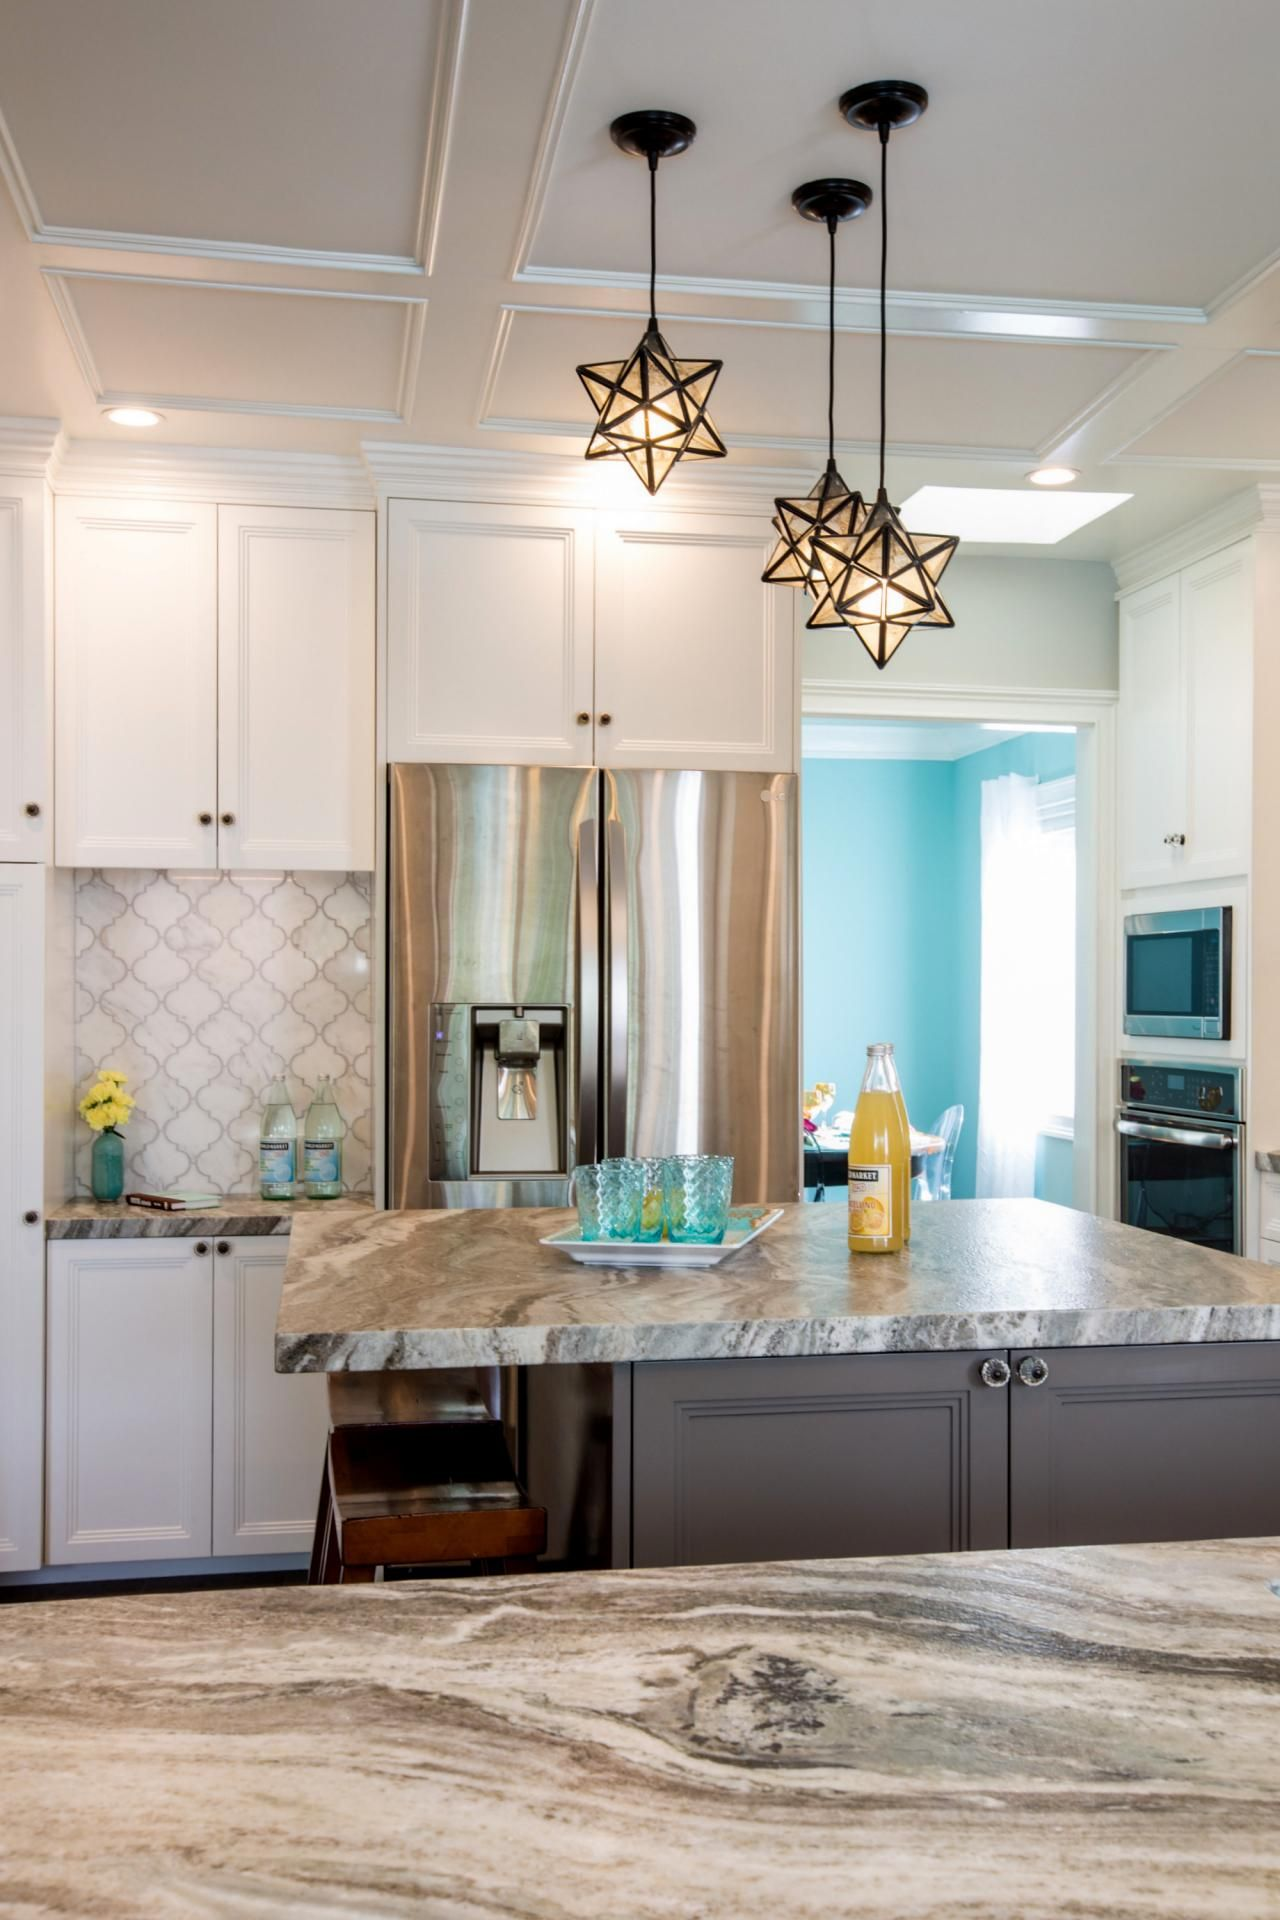 I Love The Arabesque Tile Backsplash And Star Shaped Pendant Lights Stephanie Hatten Hgtv Kitchen Pictures Kitchen Home